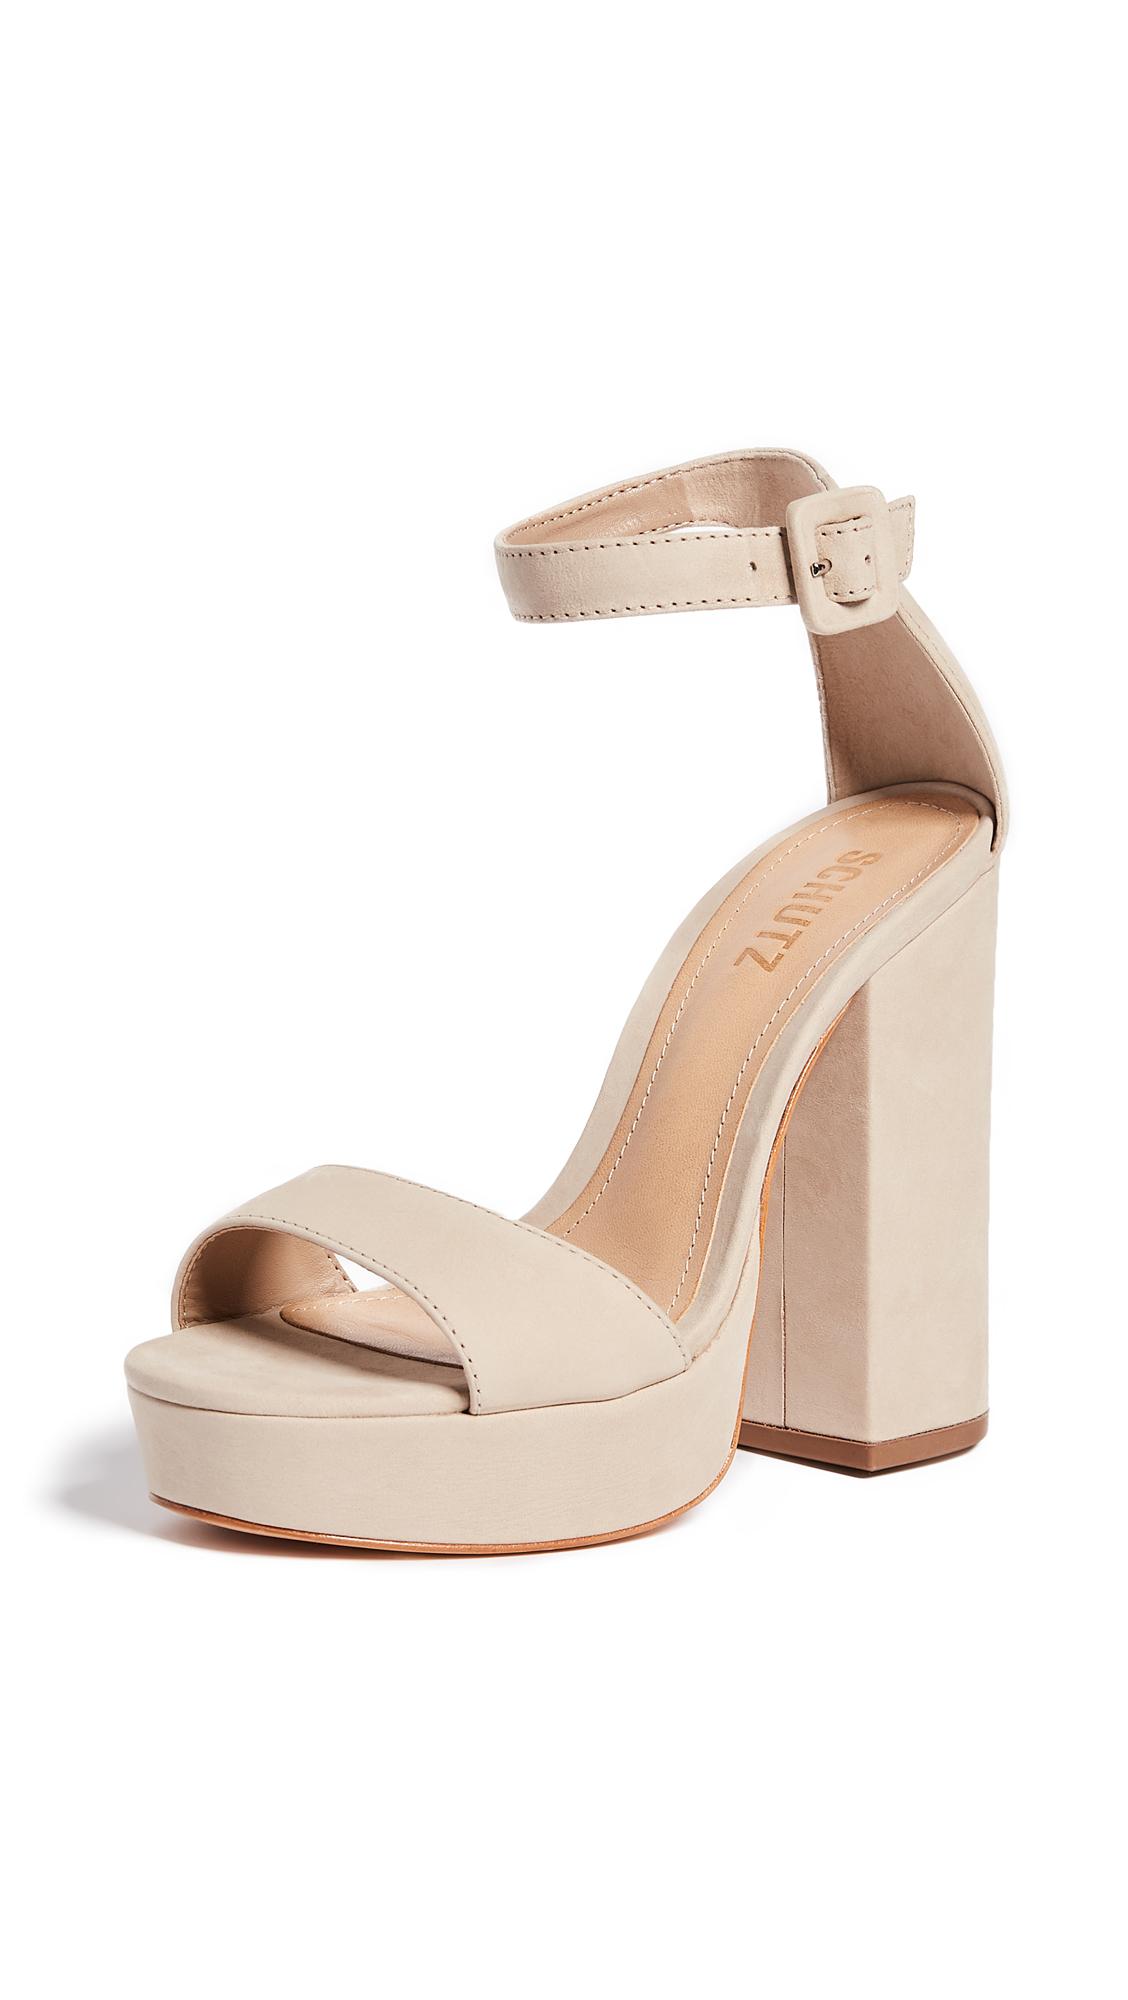 Schutz Mikella Block Heel Sandals - Oyster